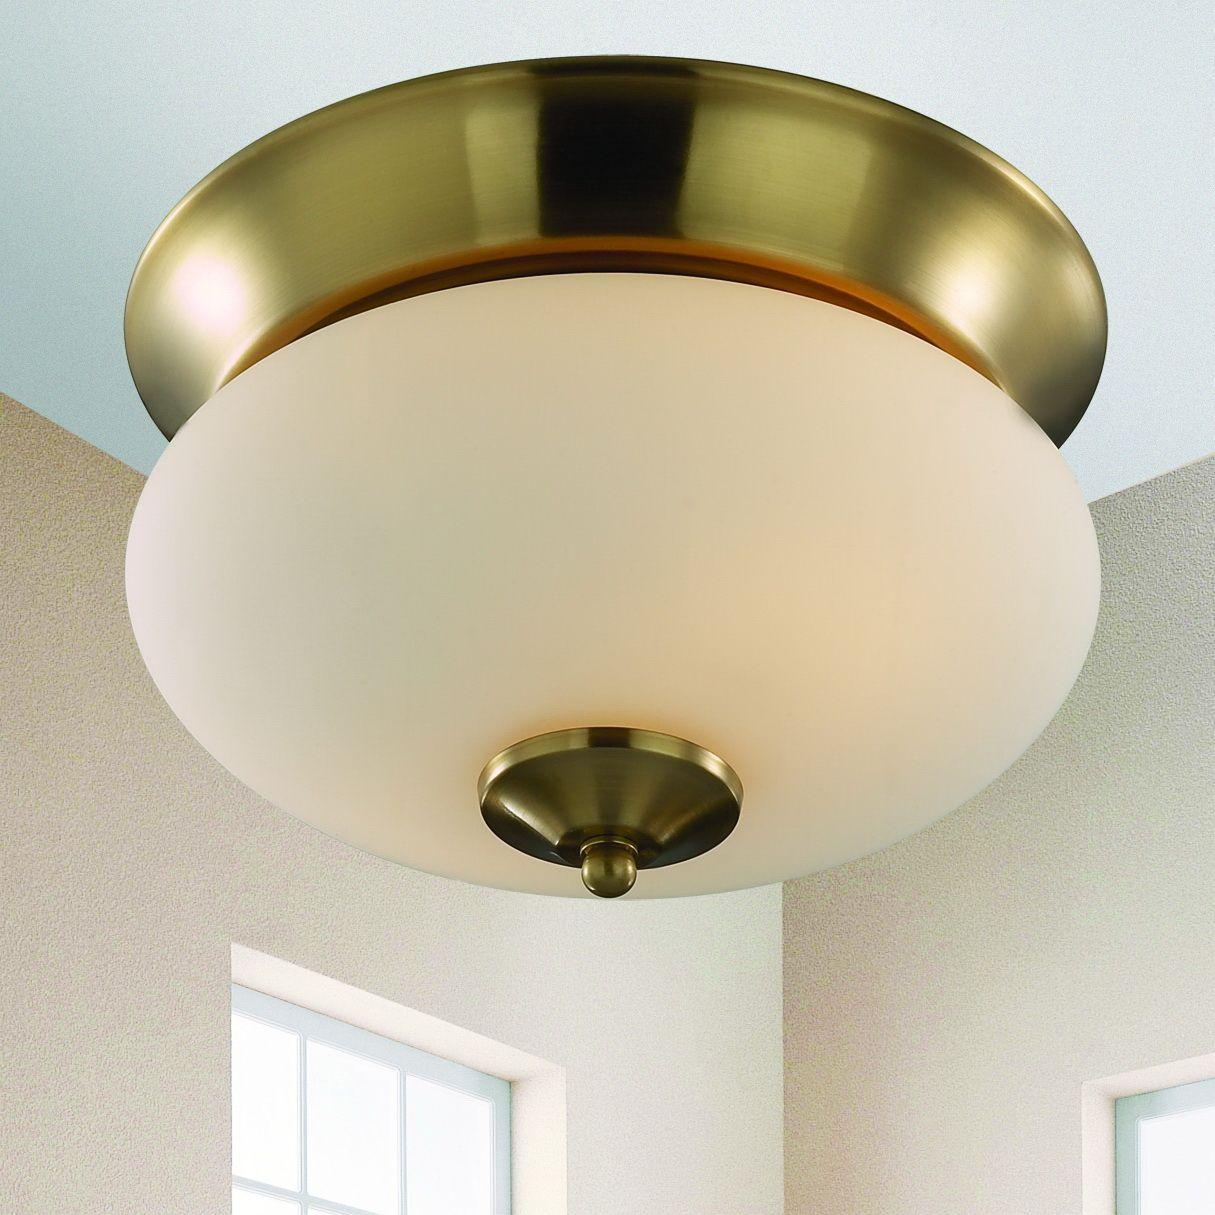 Светильник потолочный Favourite Isola, 2 х E14, 40W. 2608-2C2608-2C